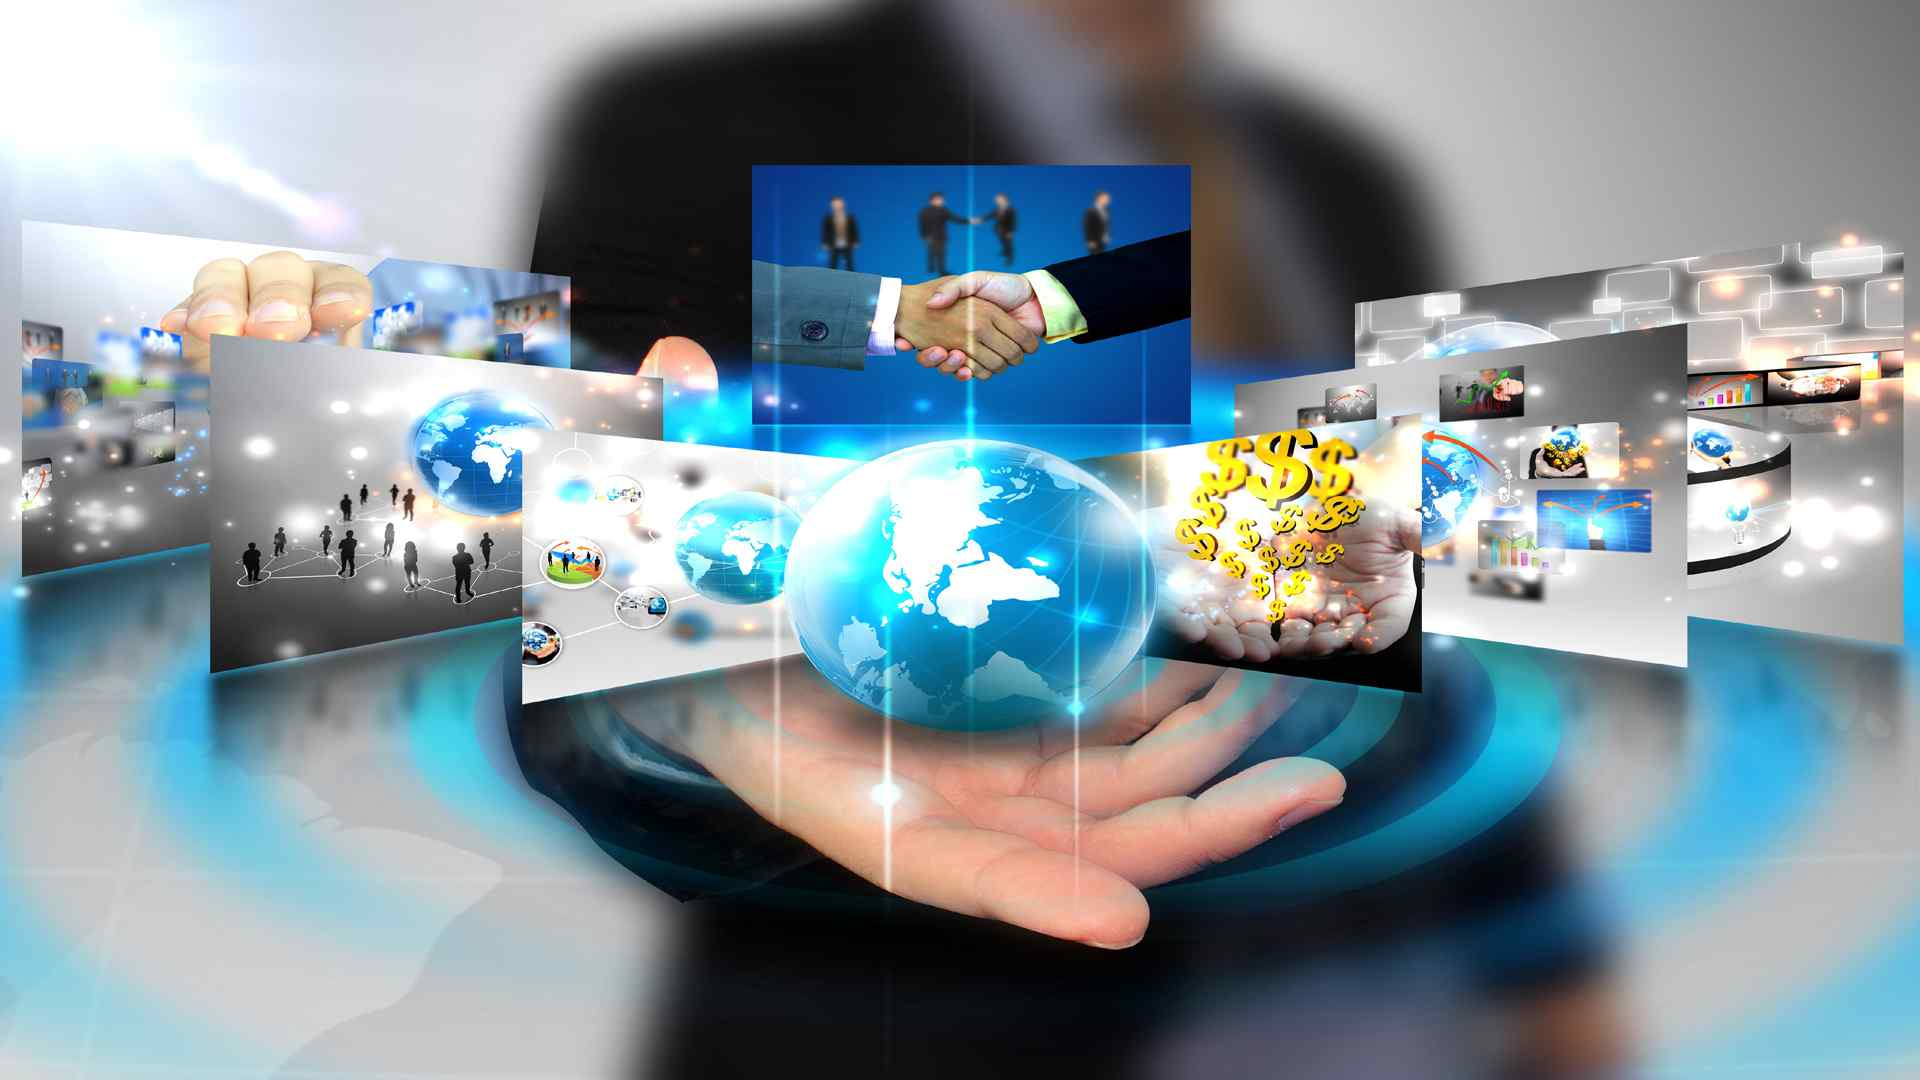 How to Pick a Terrific Broadband Internet Provider